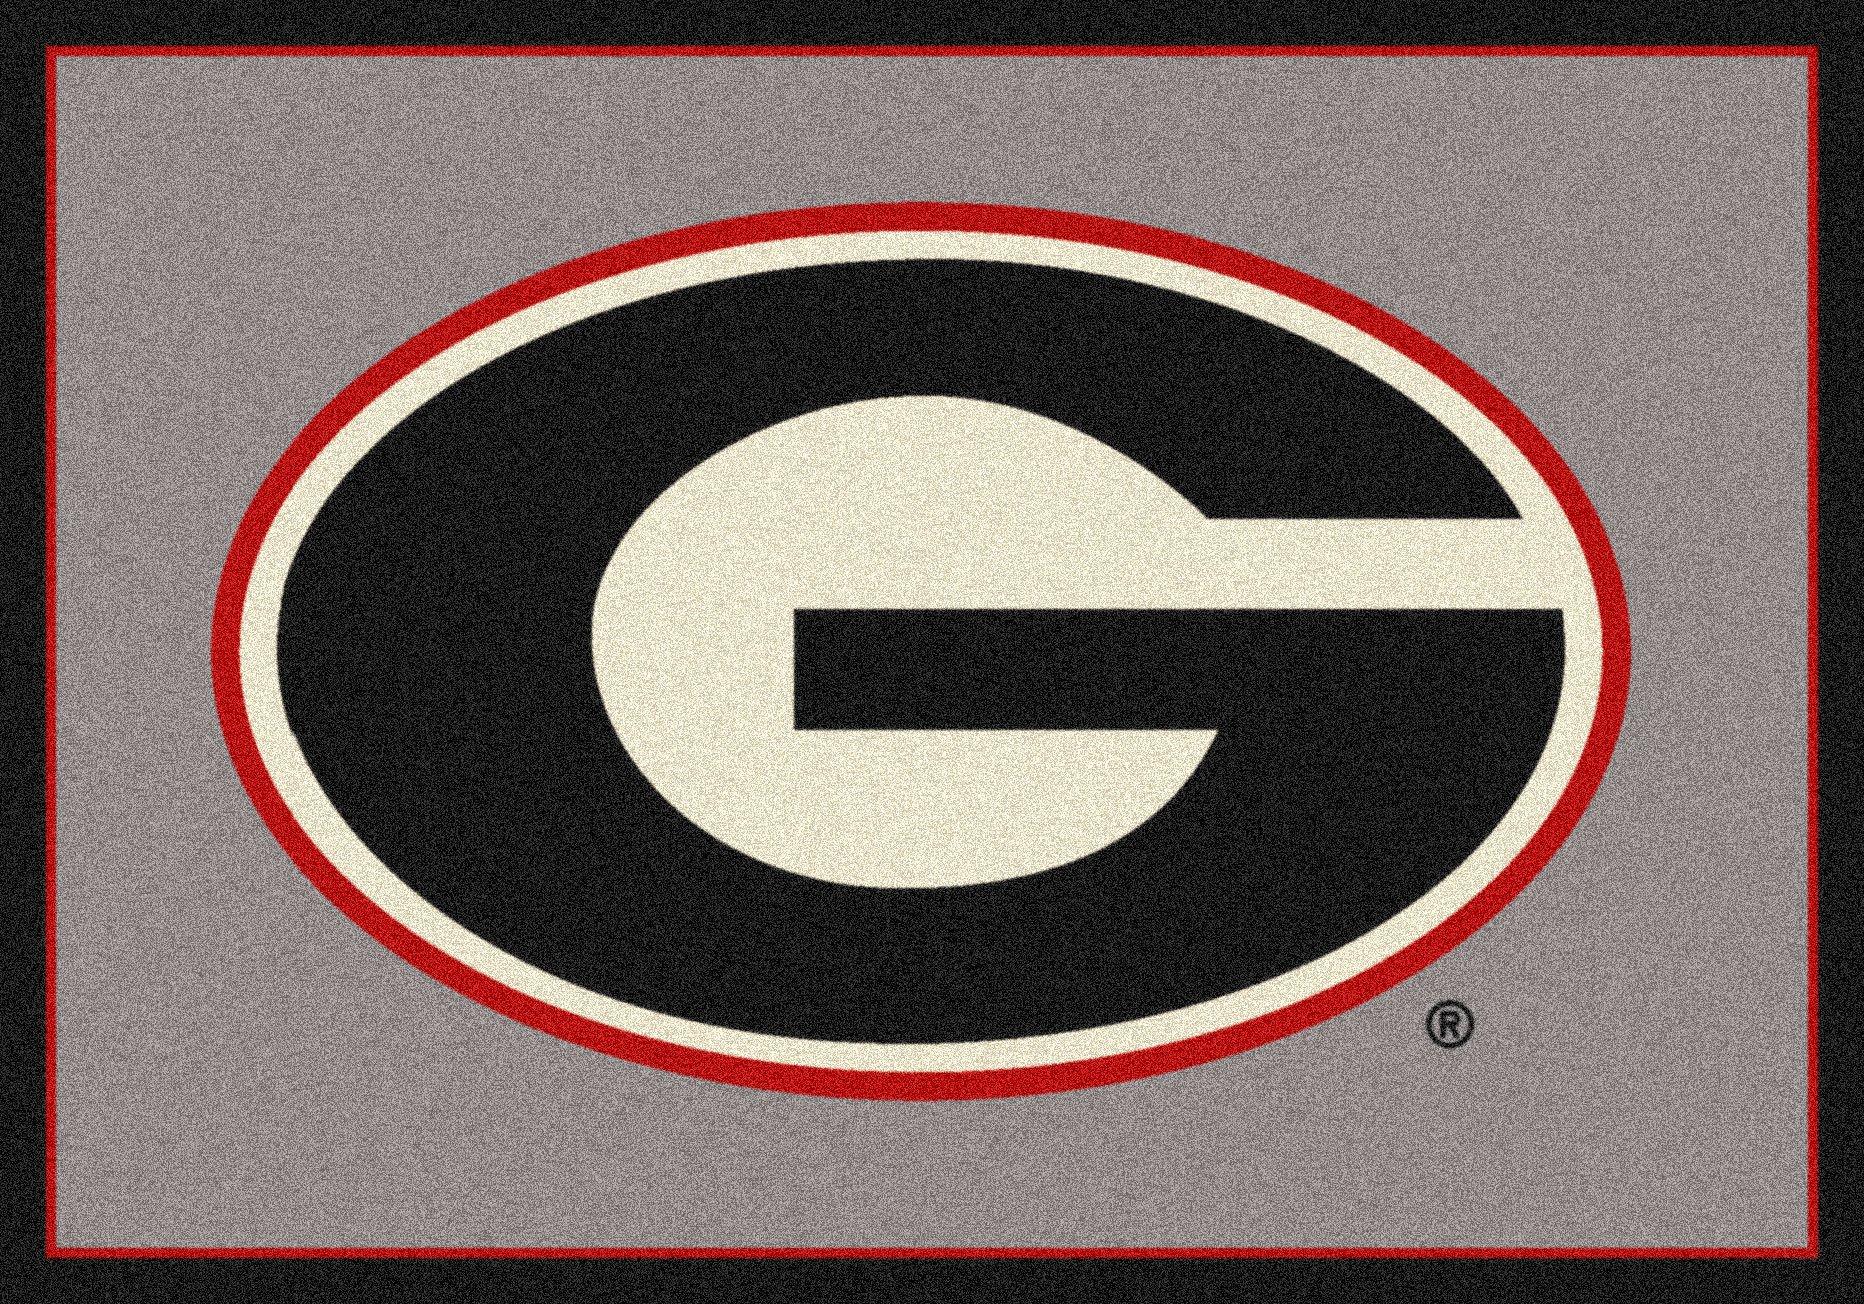 Georgia Bulldogs NCAA College Team Spirit Team Area Rug 3'10''x5'4''